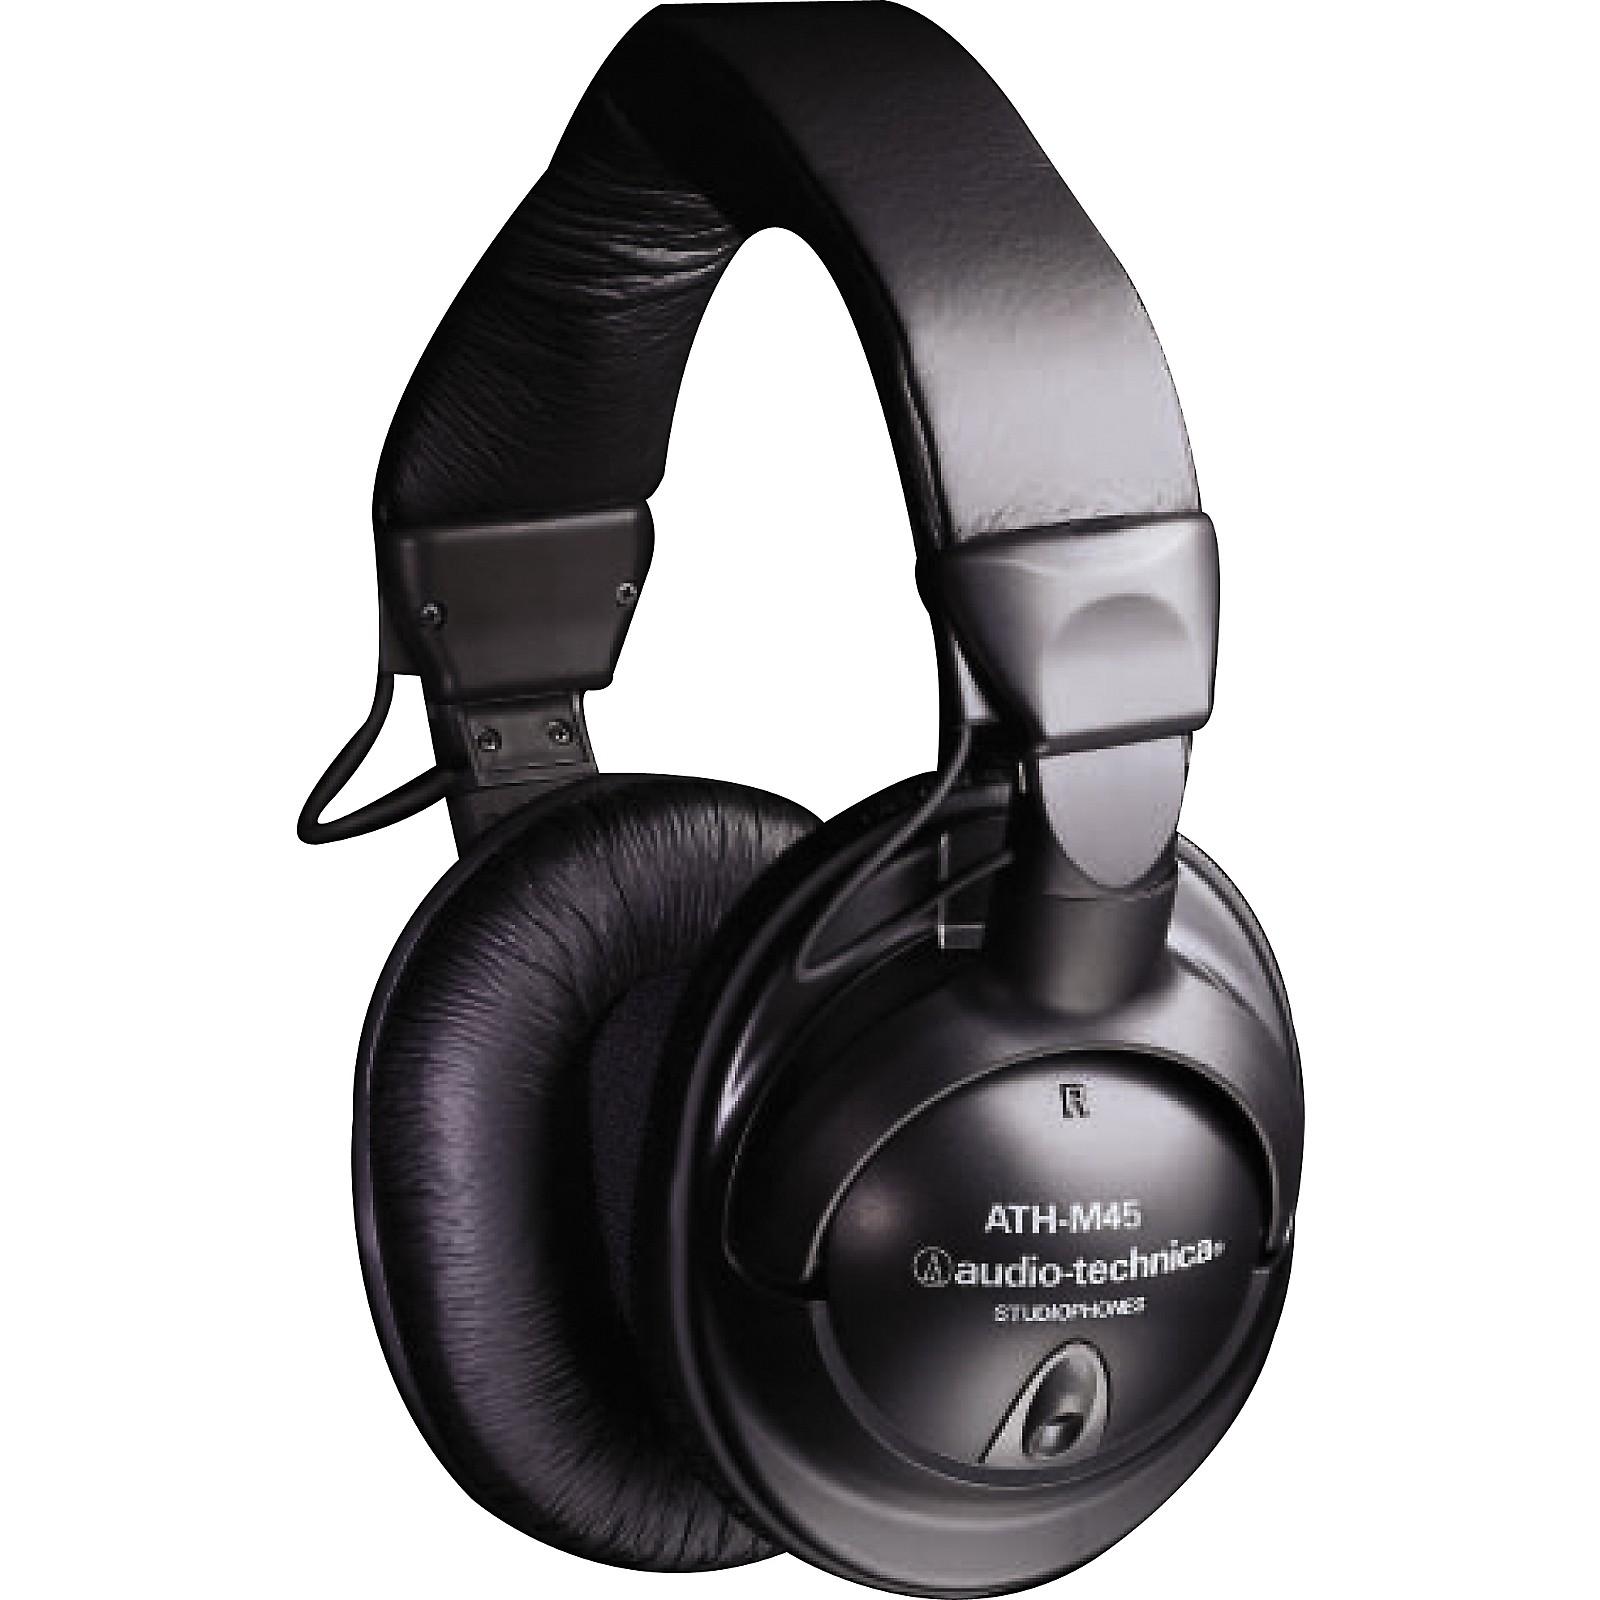 Audio-Technica ATH-M45 Studio Monitor Headphones (Black)